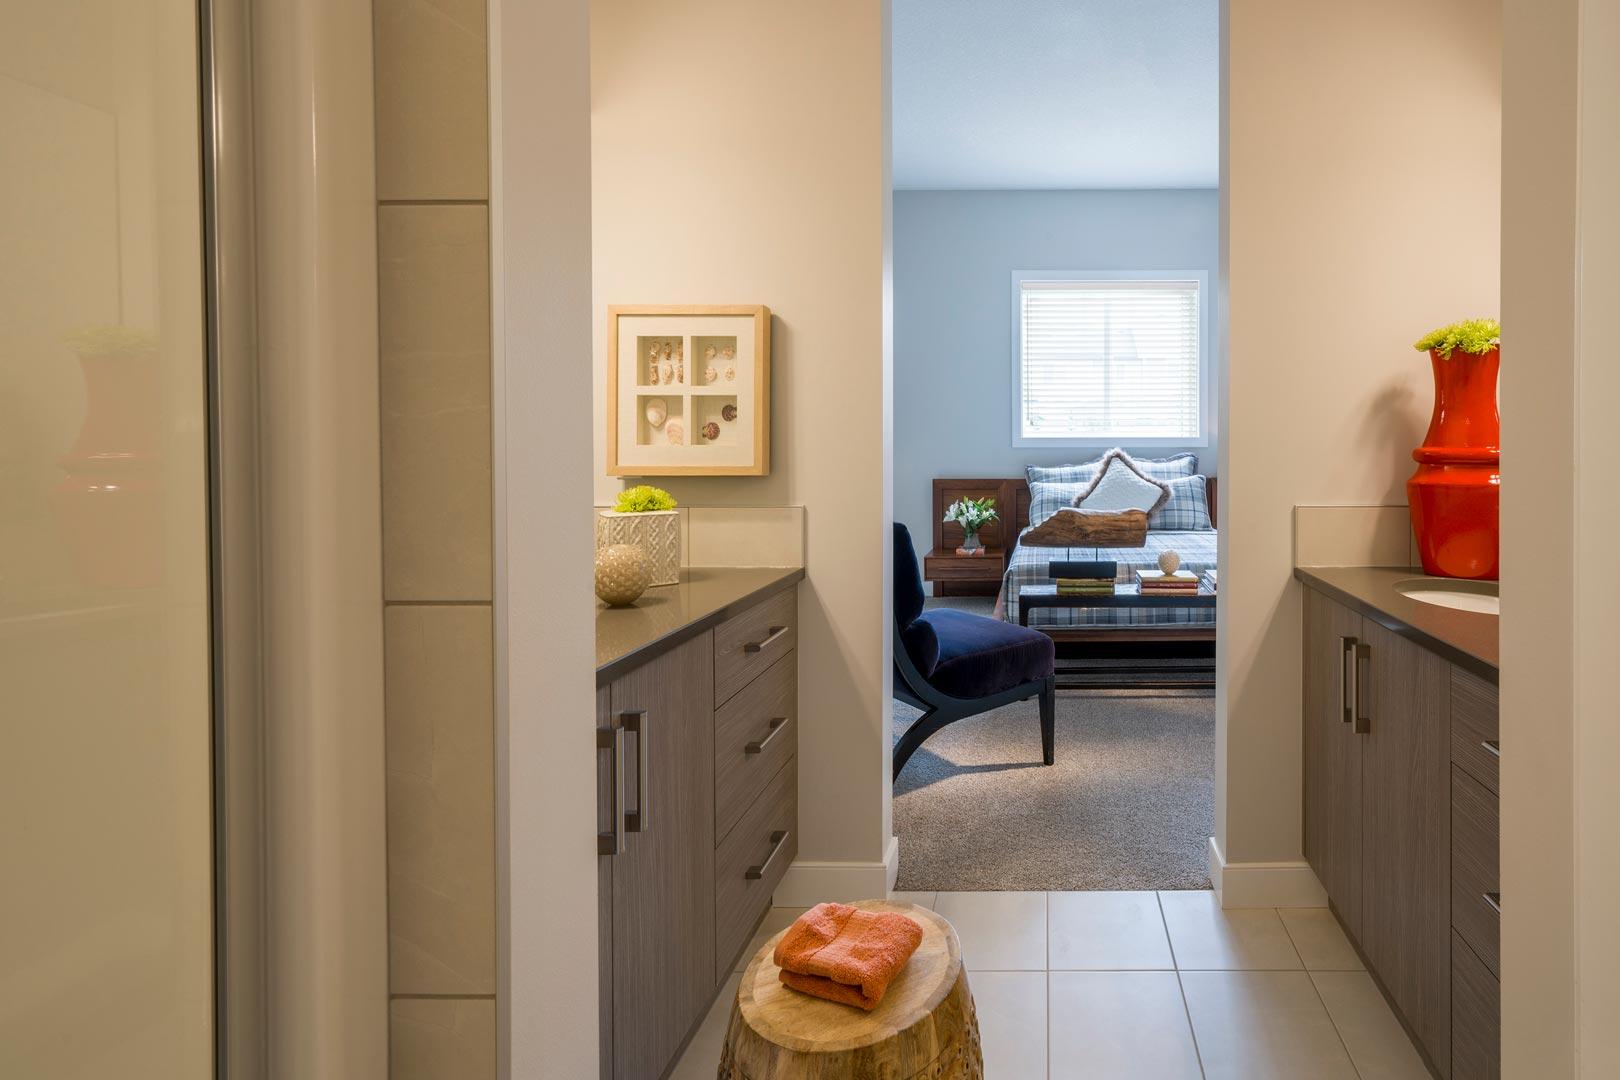 Douglas Homes Interior Image - Bathroom and Bedroom